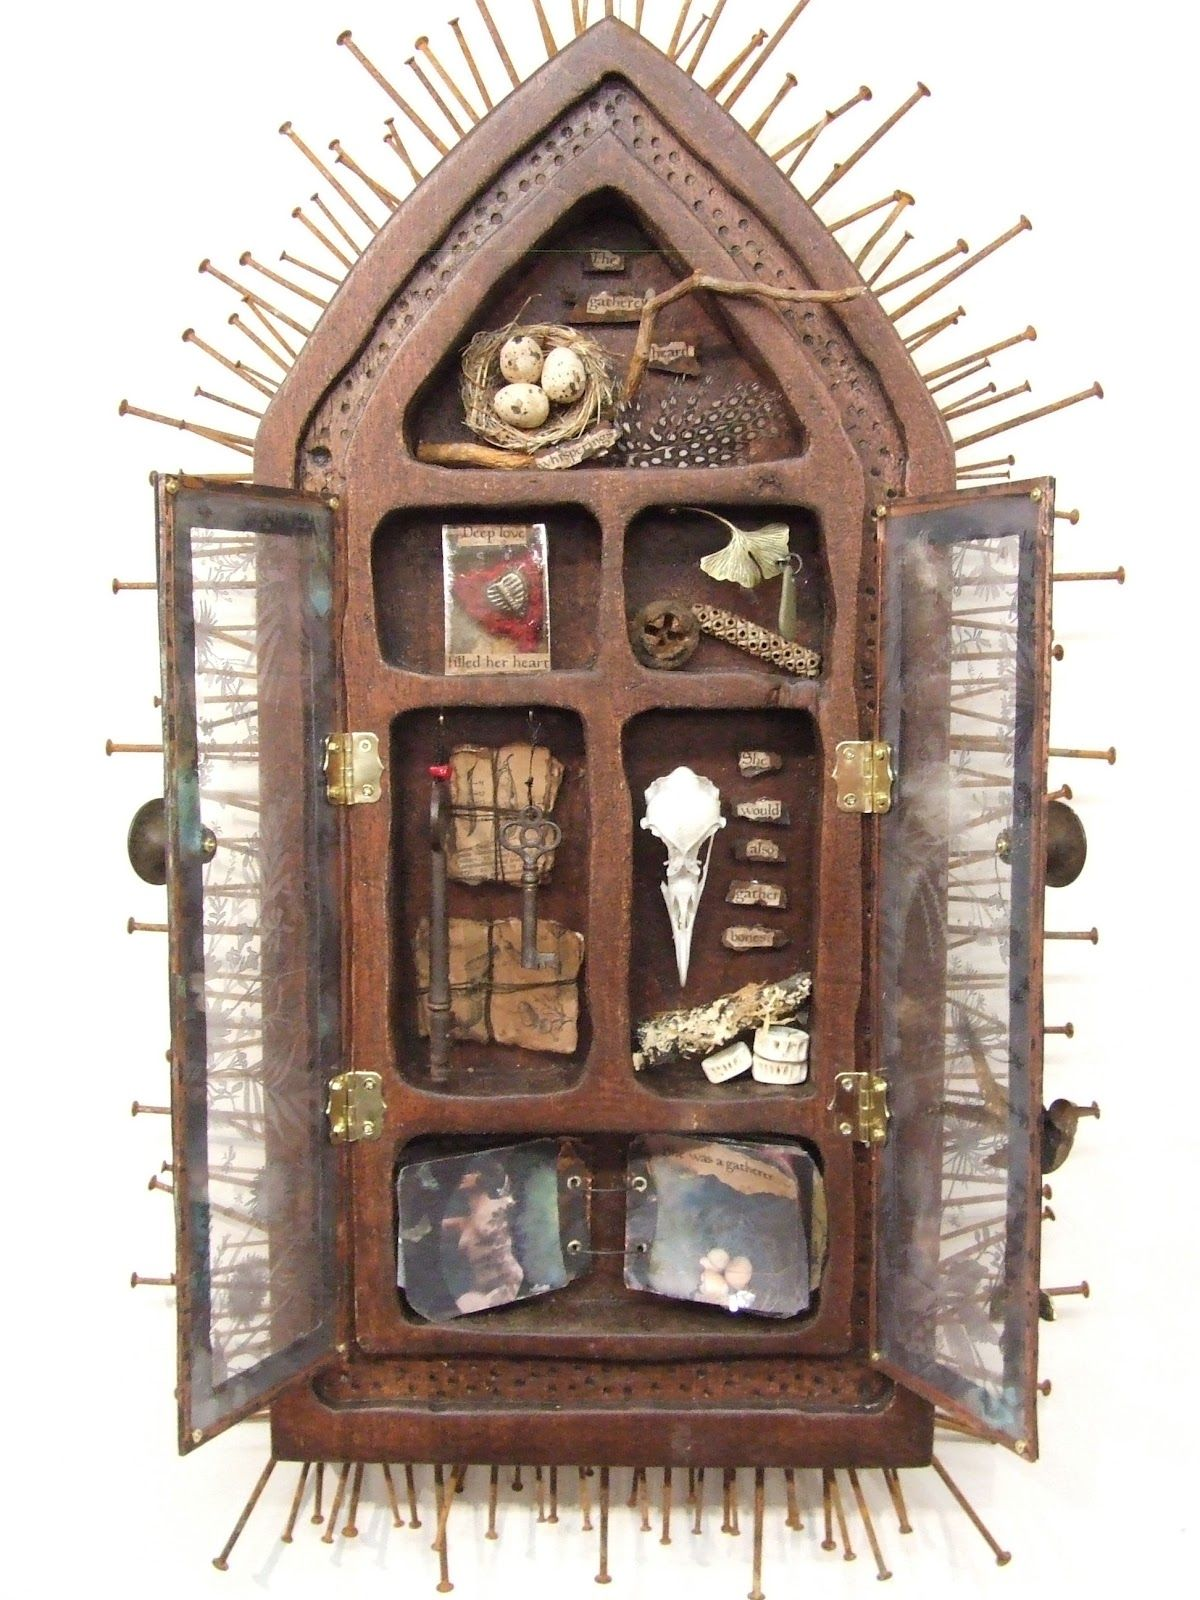 personal shrine ideas - Google Search | Shrines art, Altar